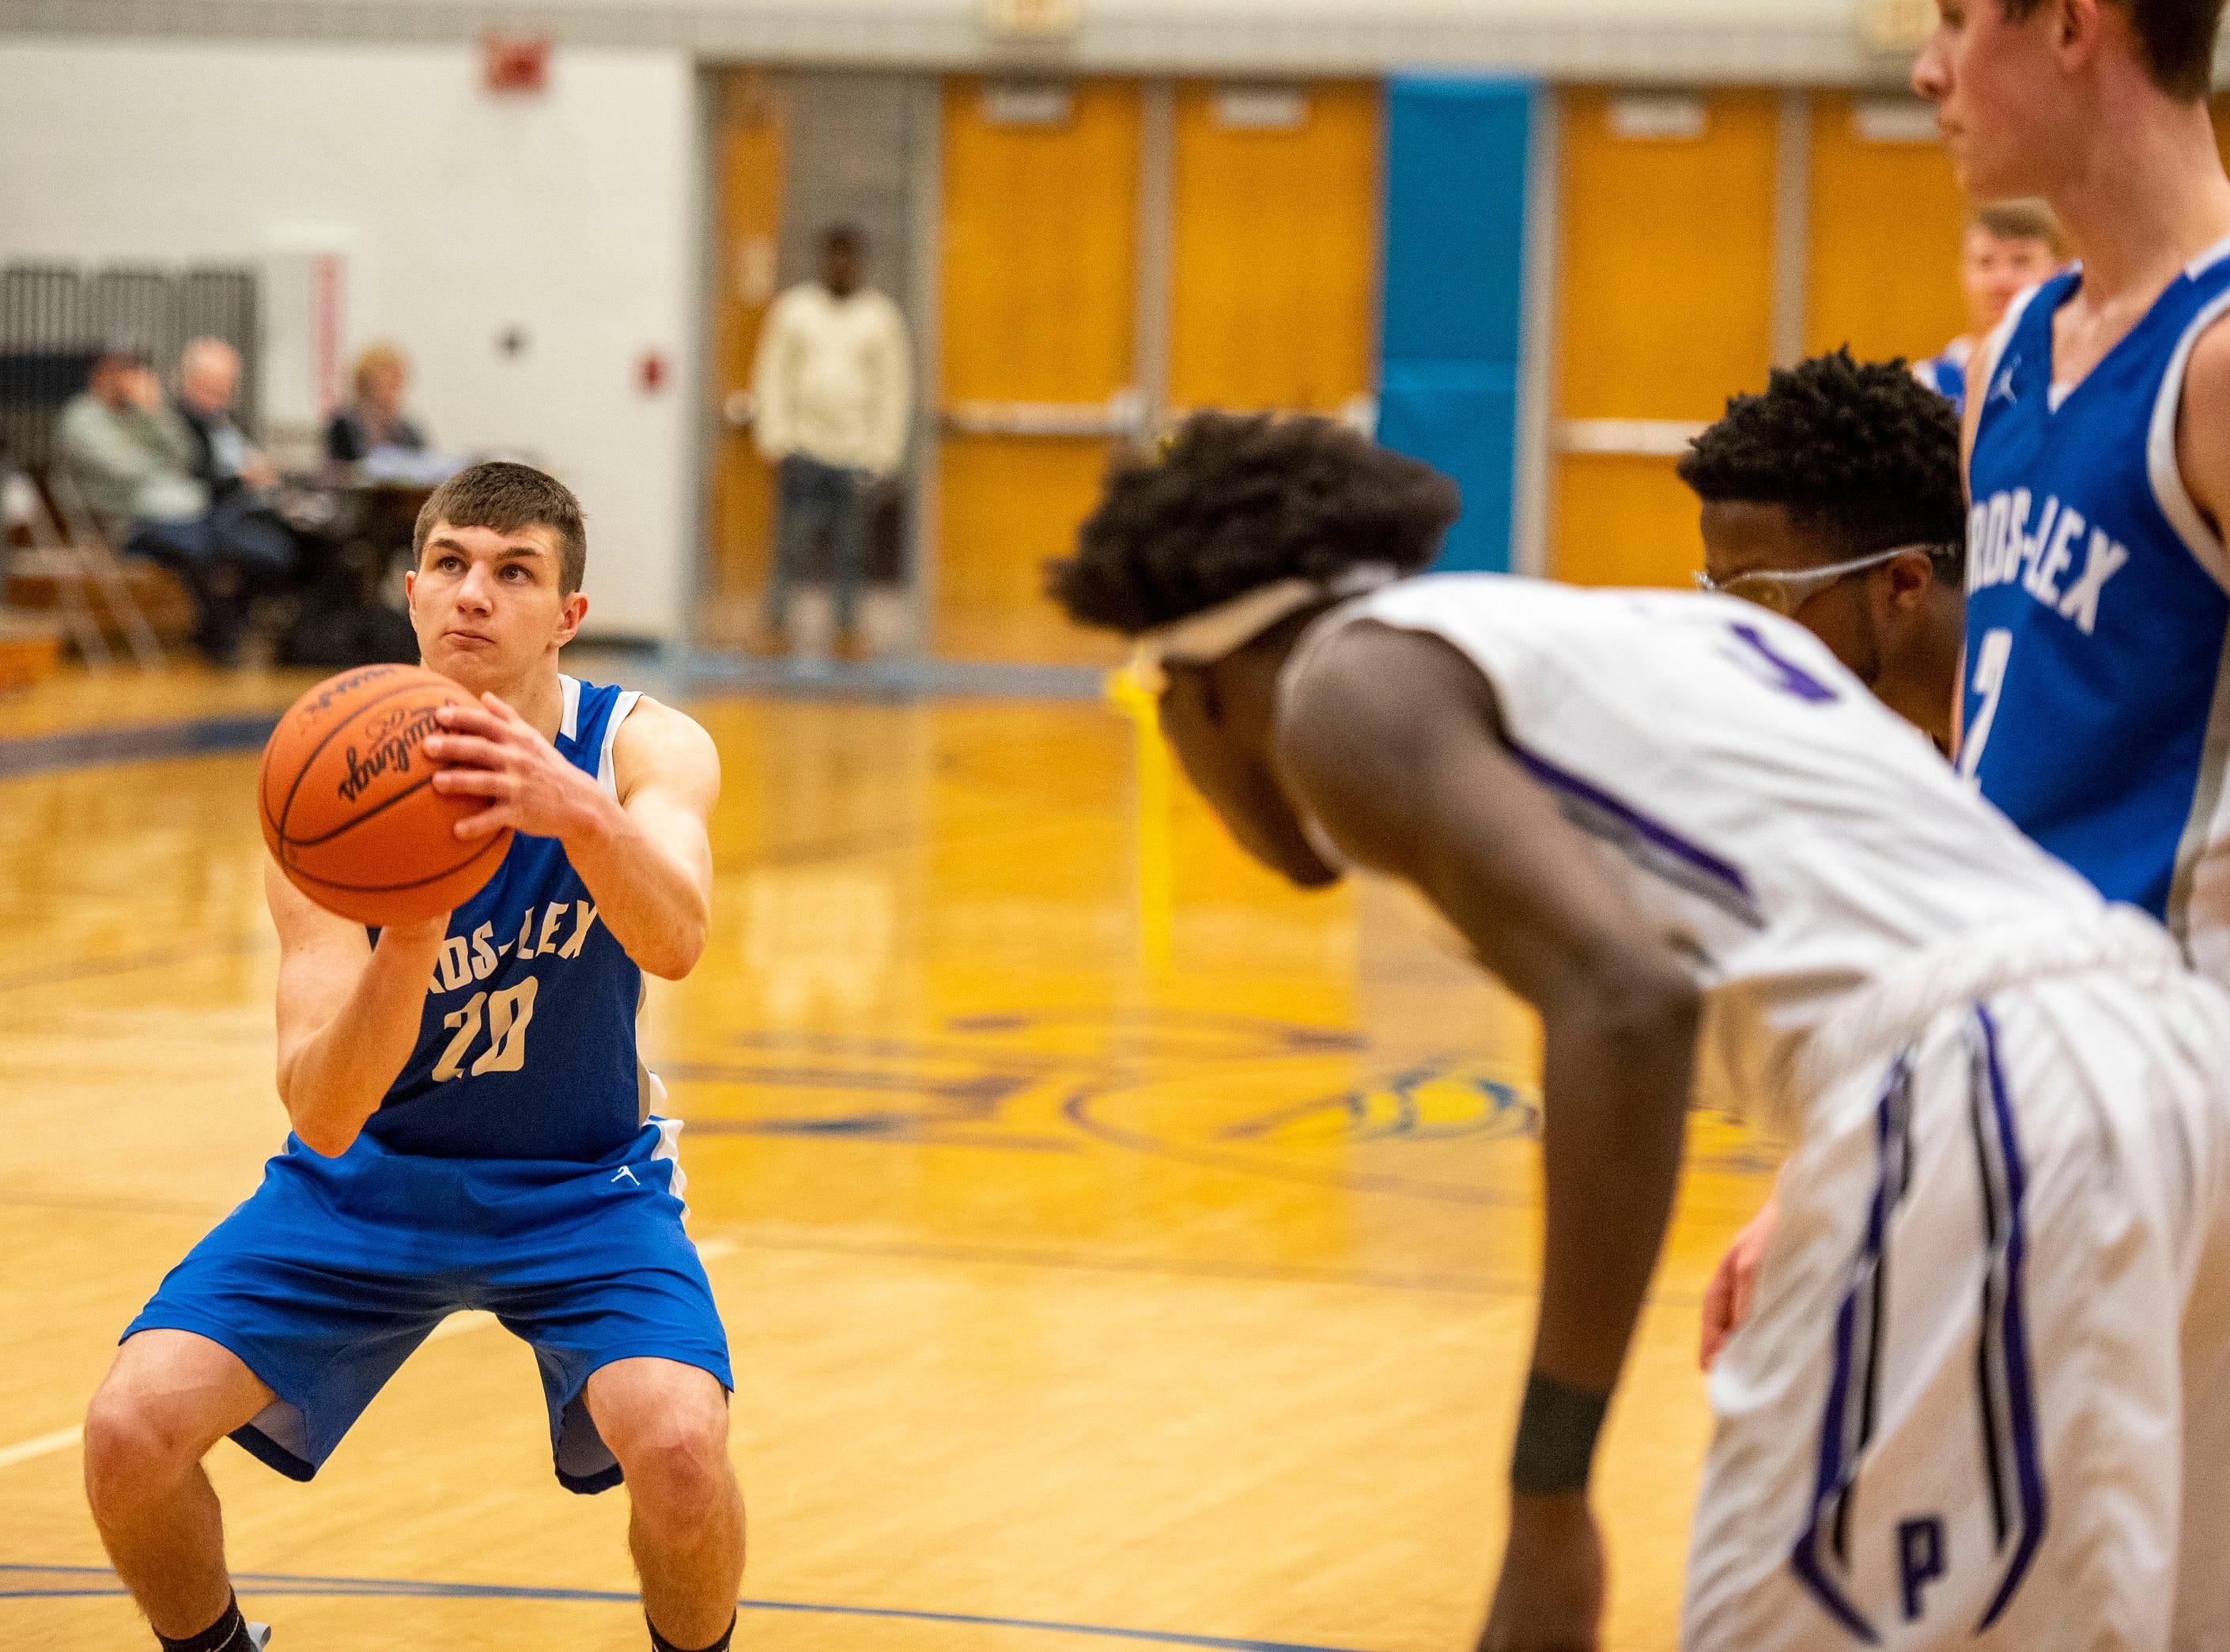 Cros-Lex High School's Jake Noll shoots a free throw in the MHSAA Division 2 regional basketball game against Pontiac High School Tuesday, March 5, 2019 at Imlay City High School.